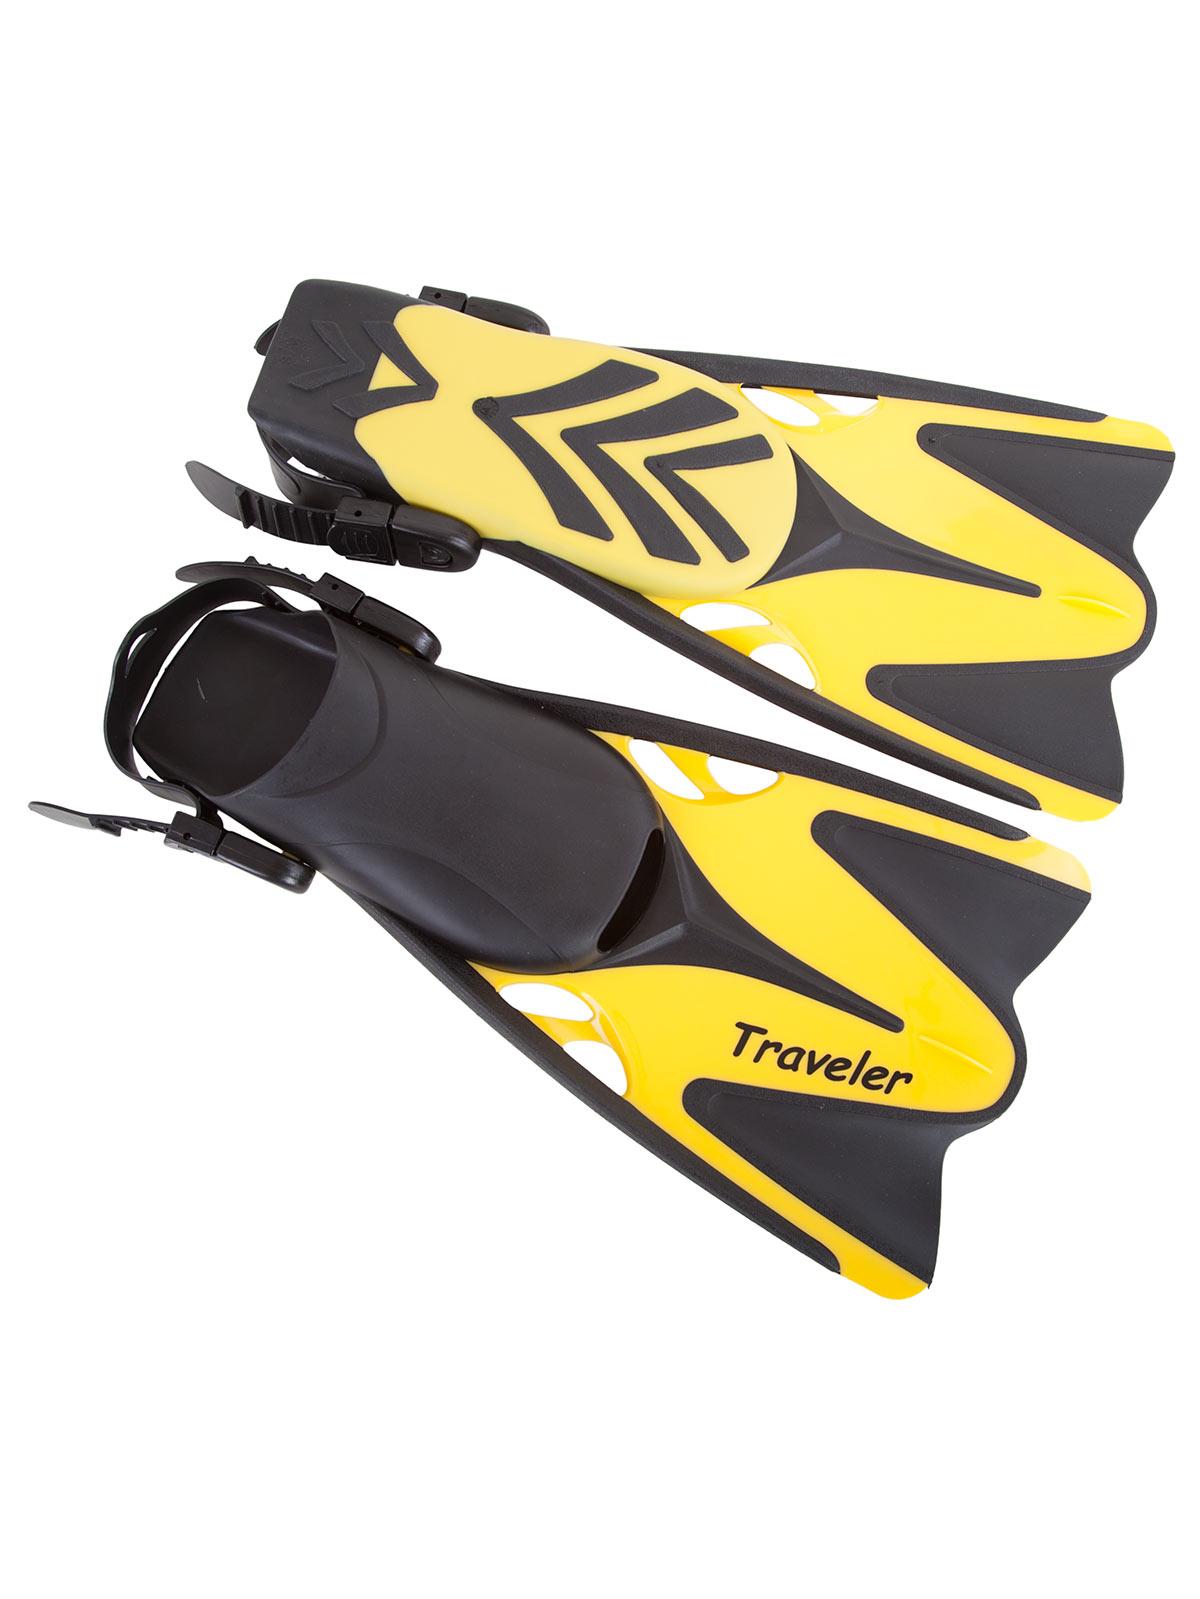 Sea-Dive-Traveler-Snorkeling-Fins